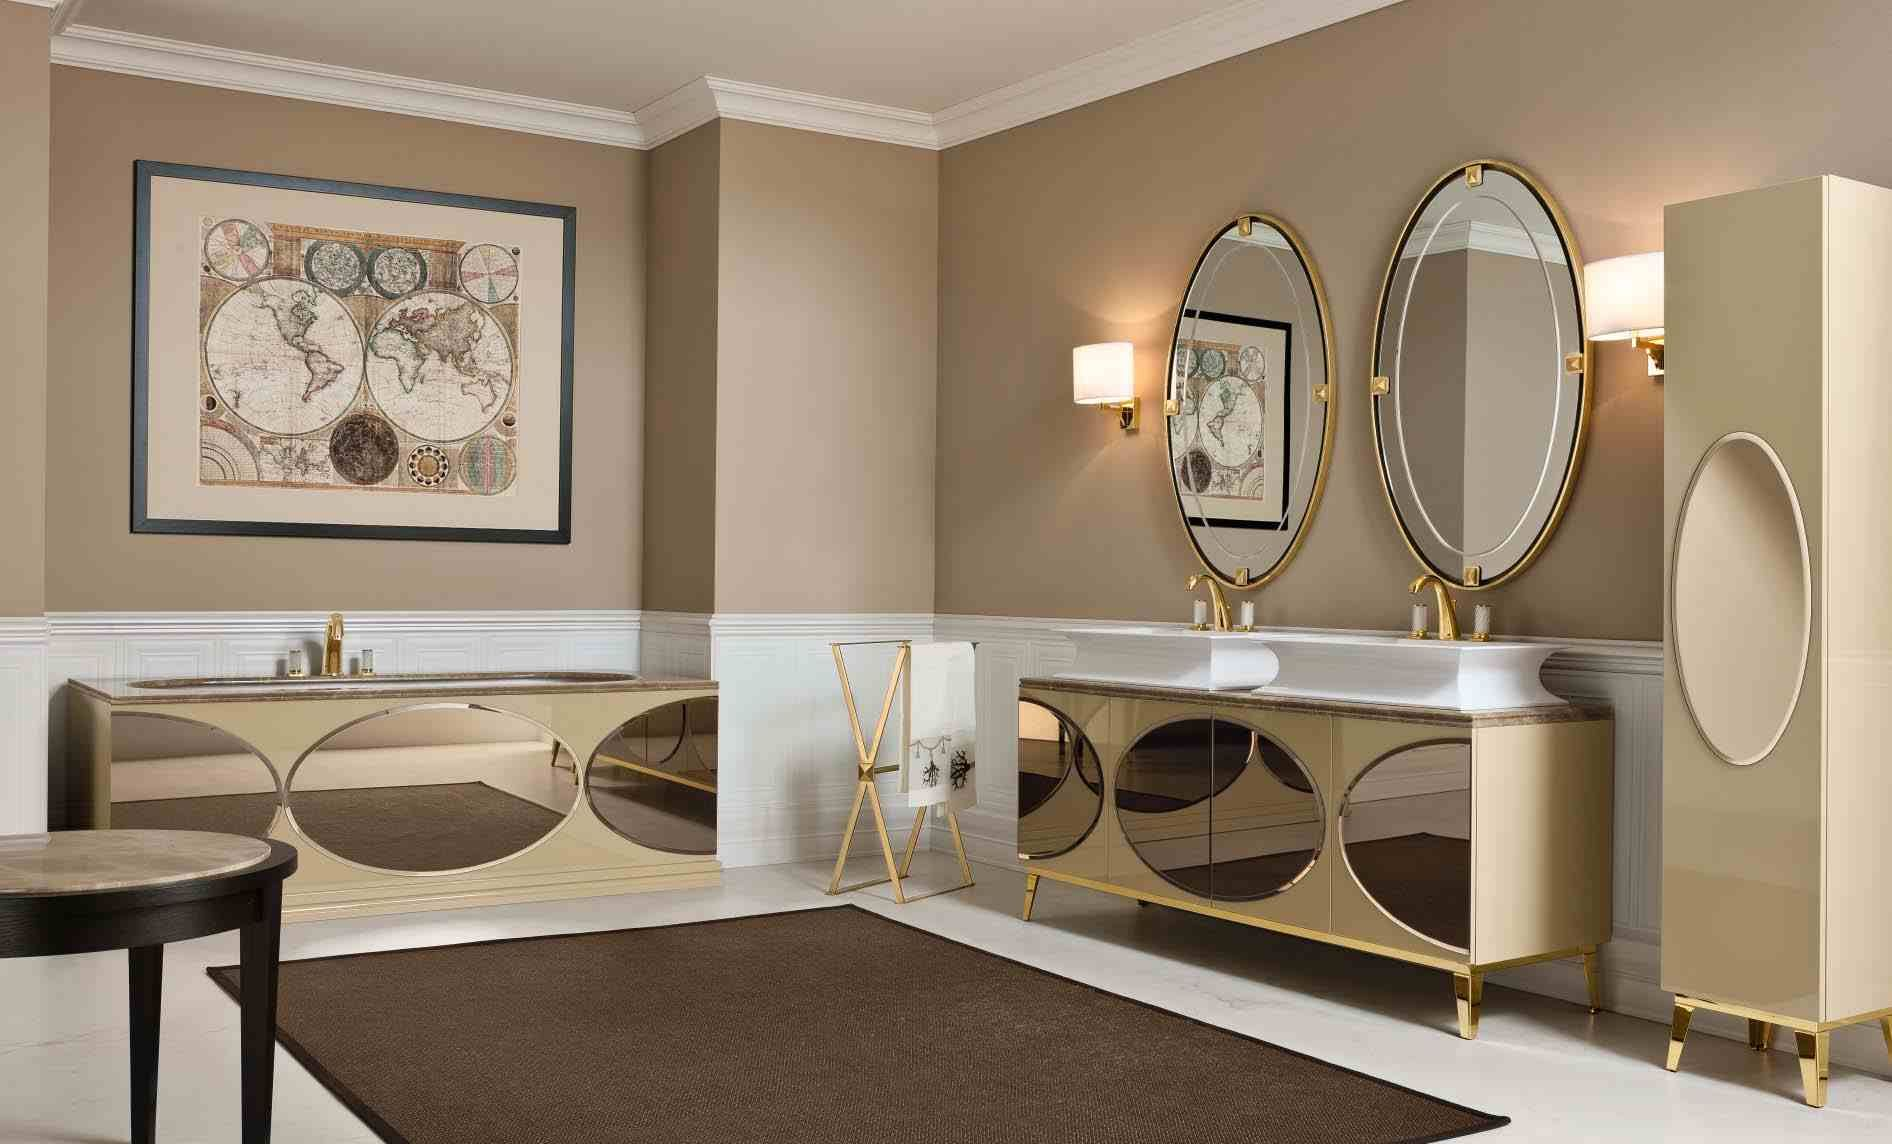 Meuble Salle De Bain Moderne Tapis Marron Fonce Peinture